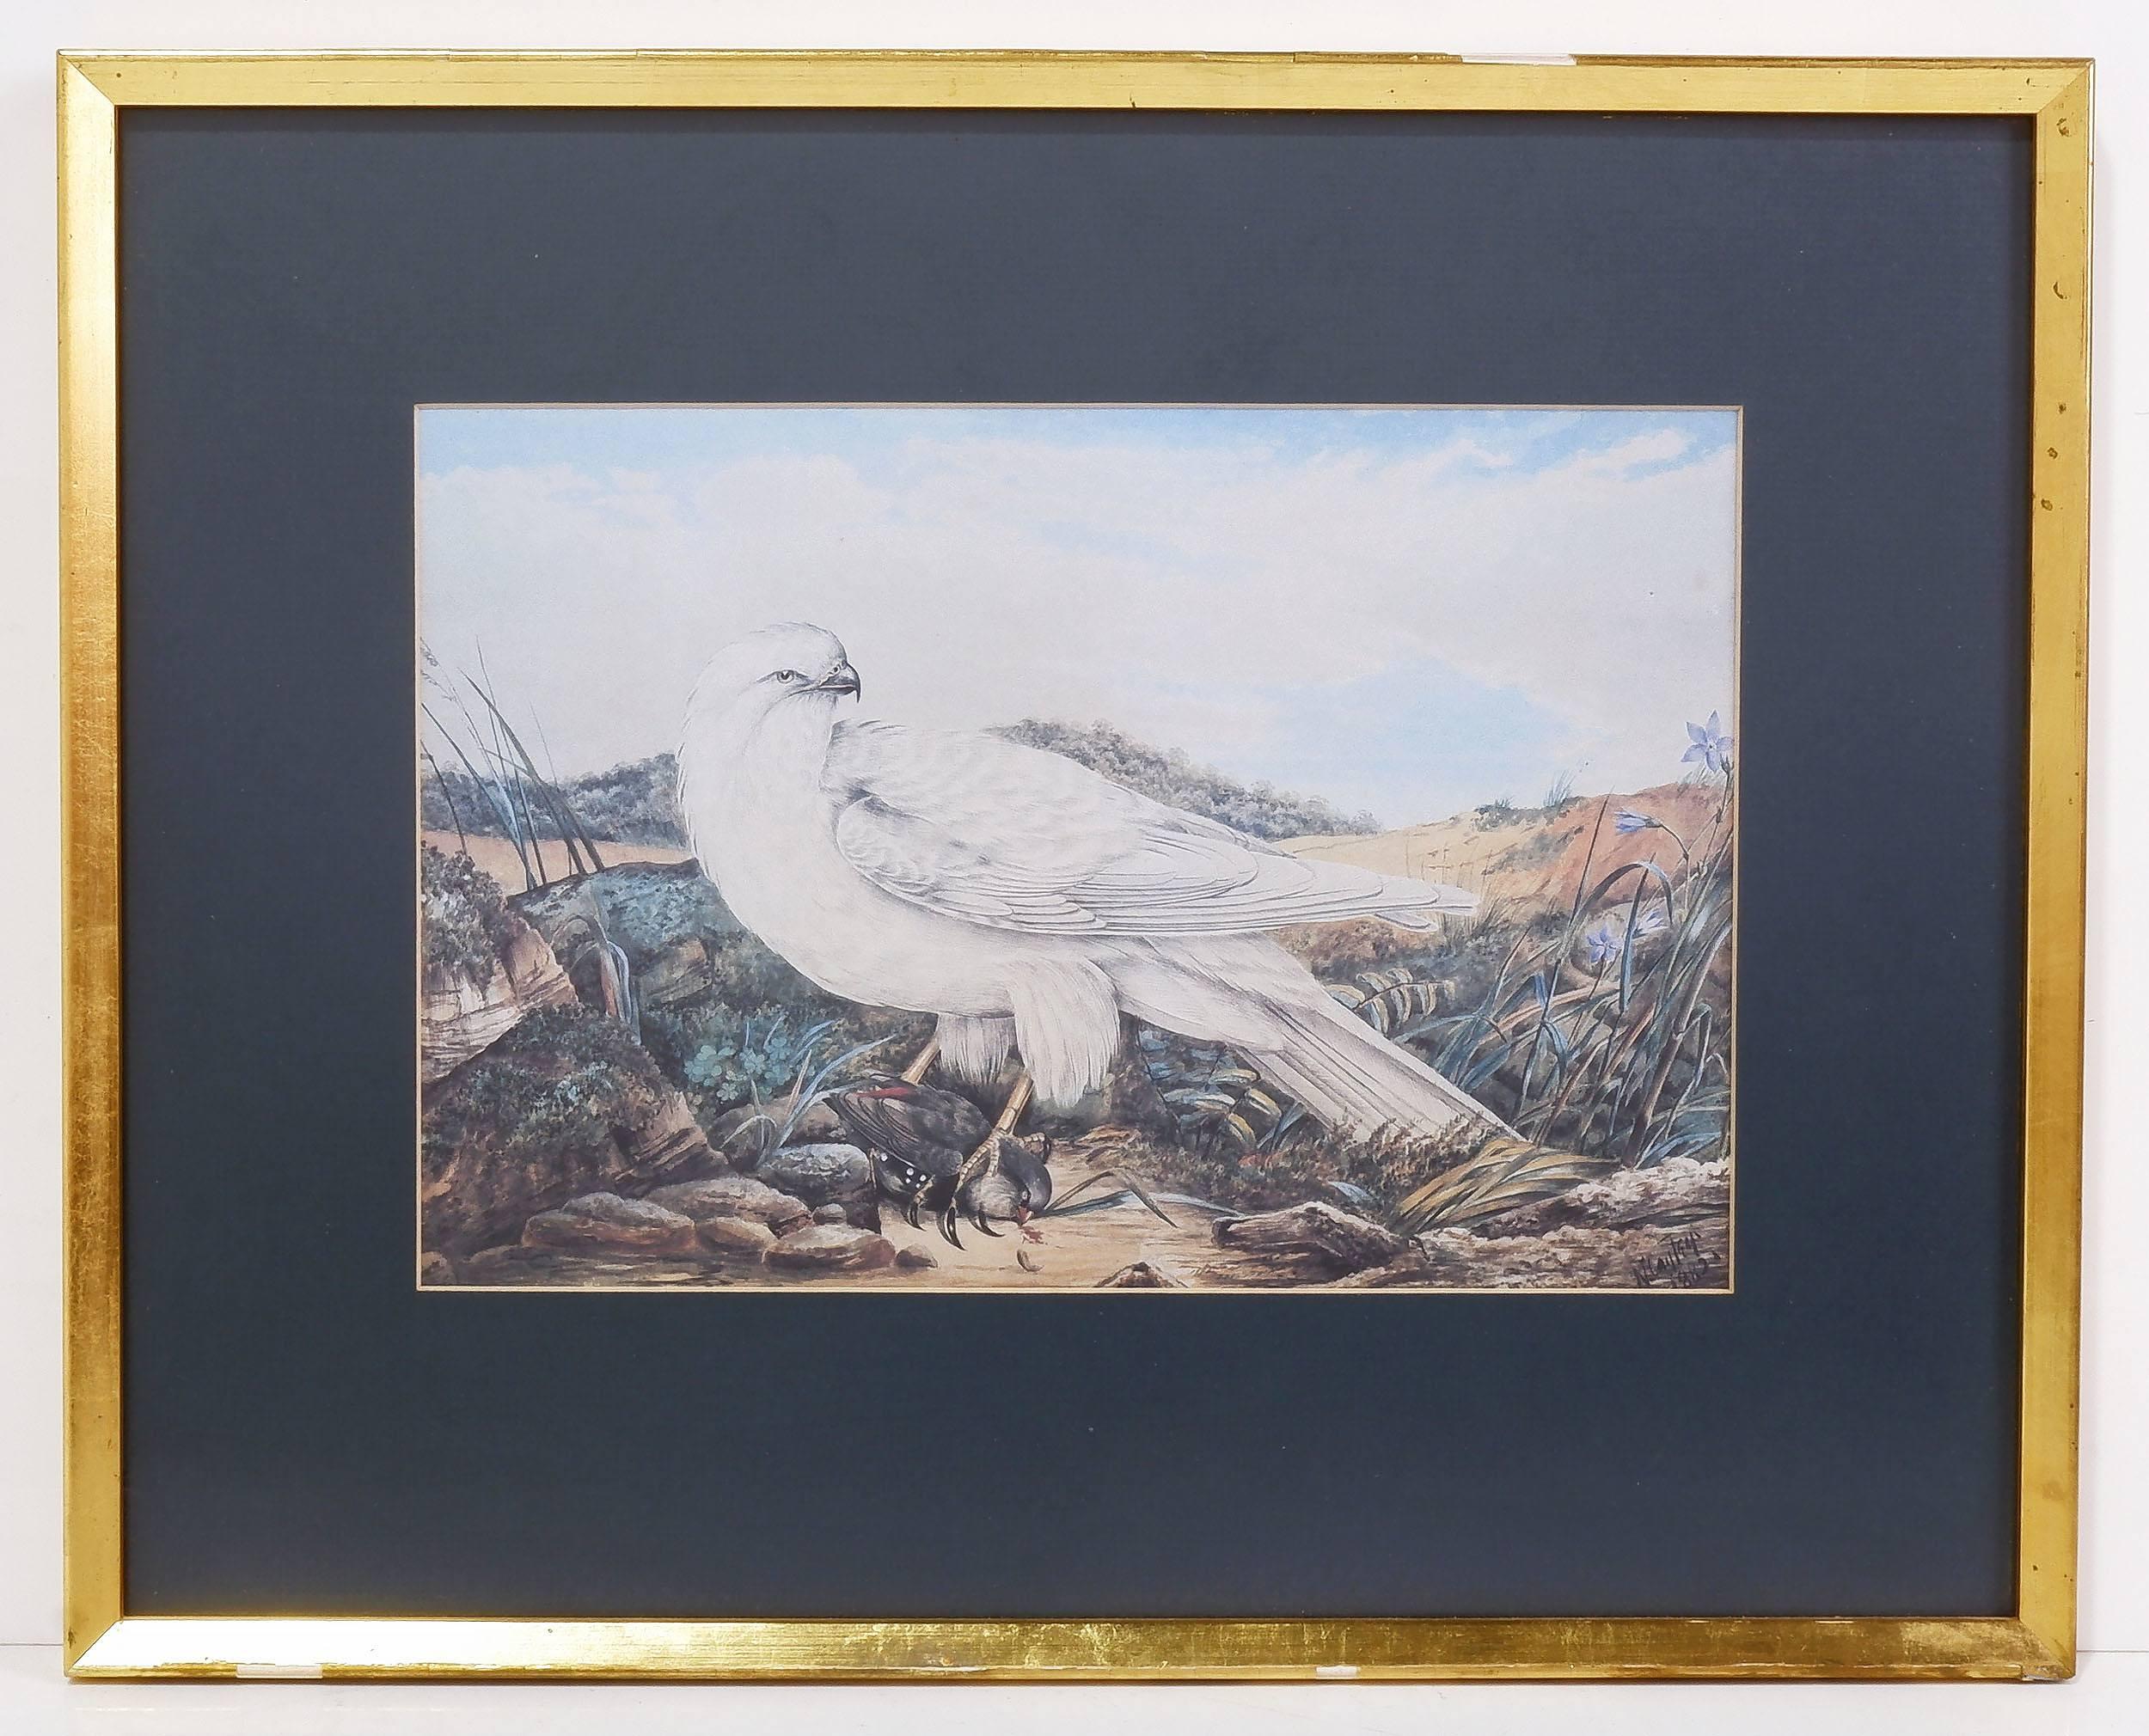 'Neville Cayley, Eagle Print 1882'